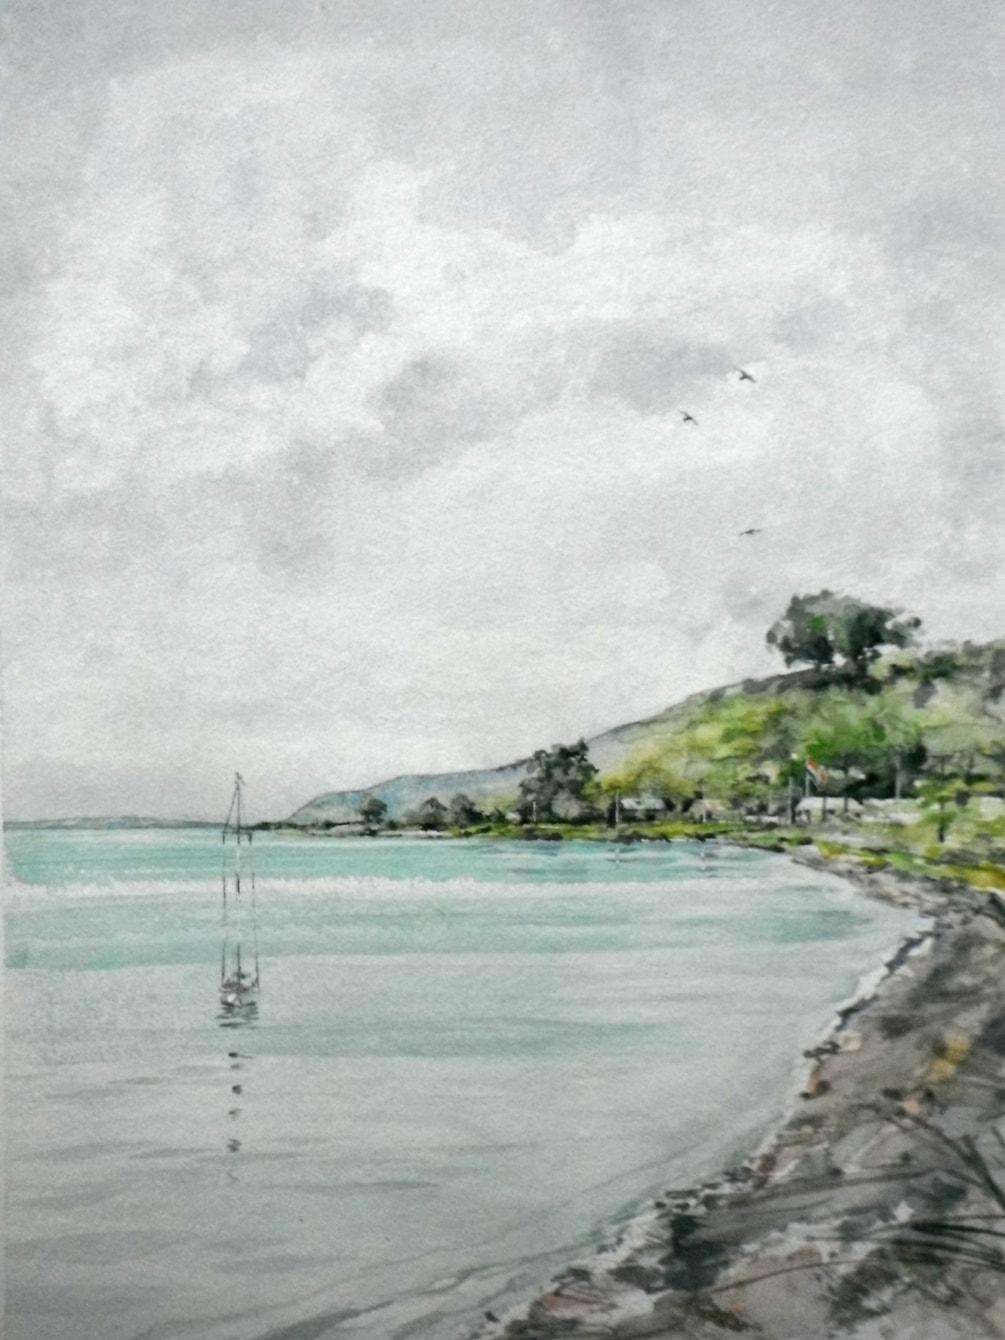 Te Mata, Coromandel Coast